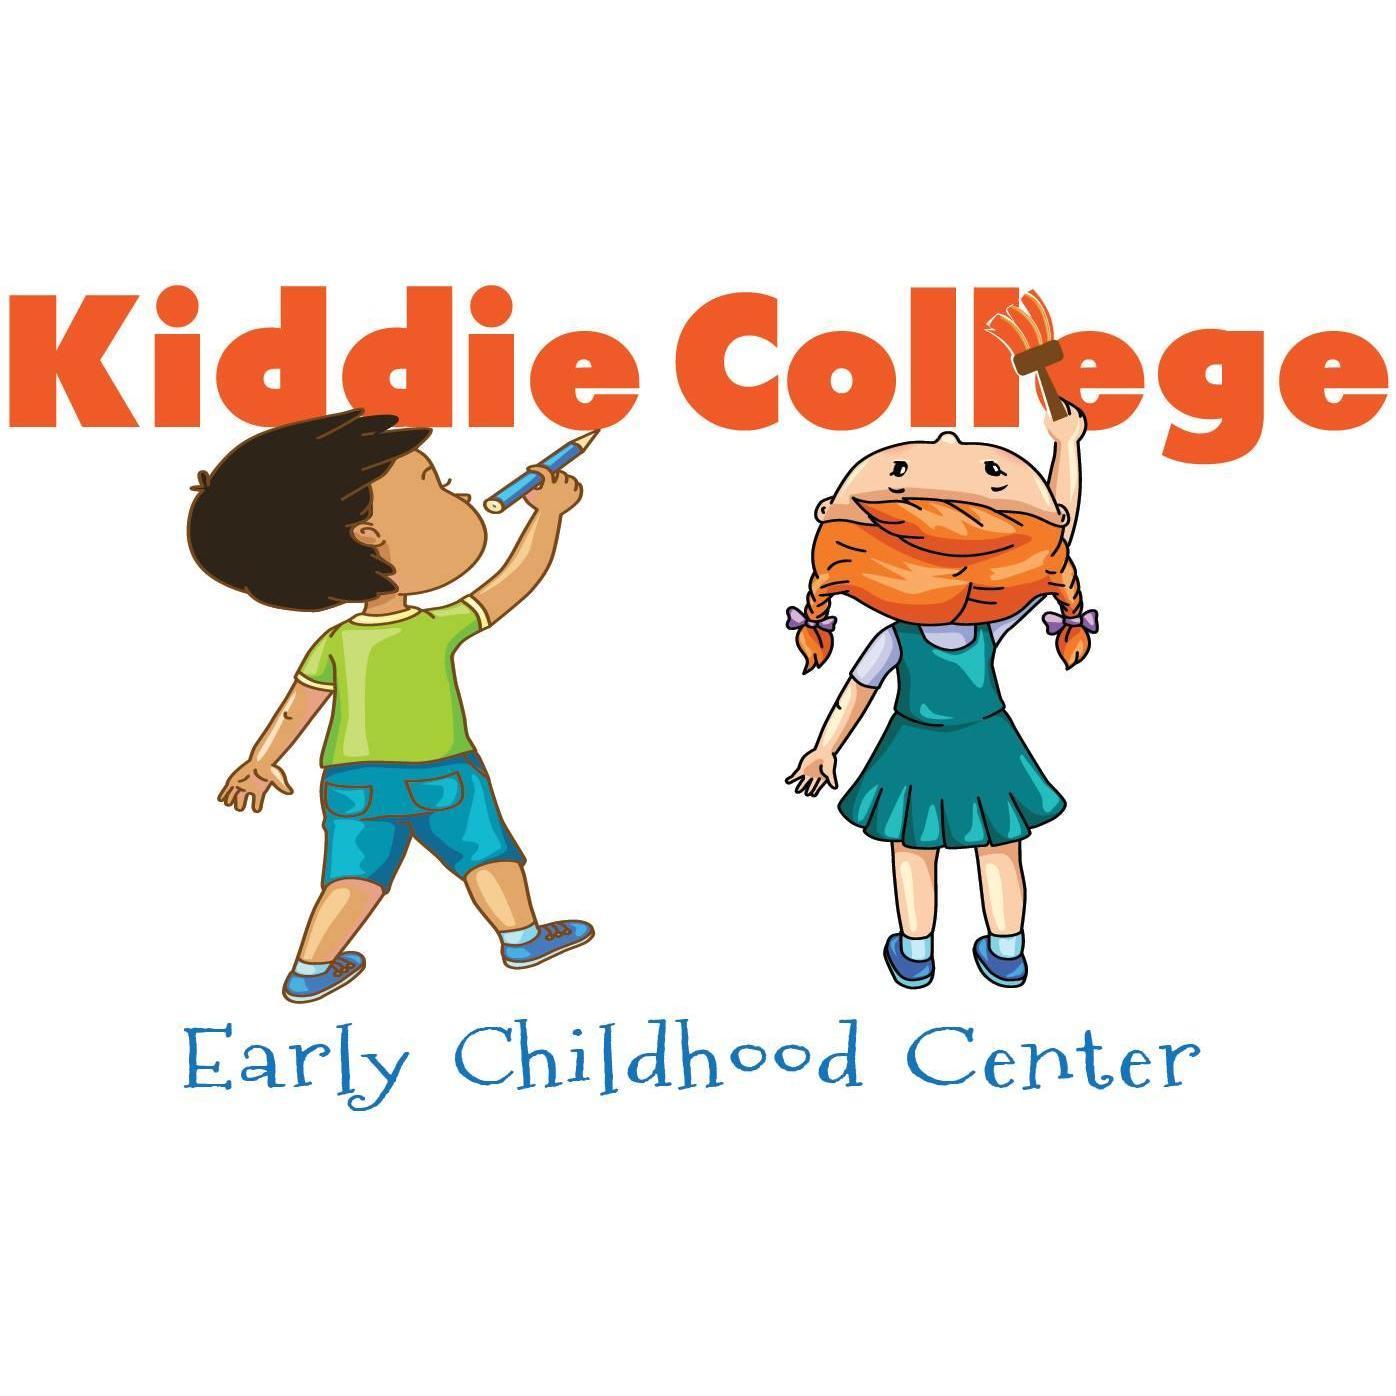 Kiddie College